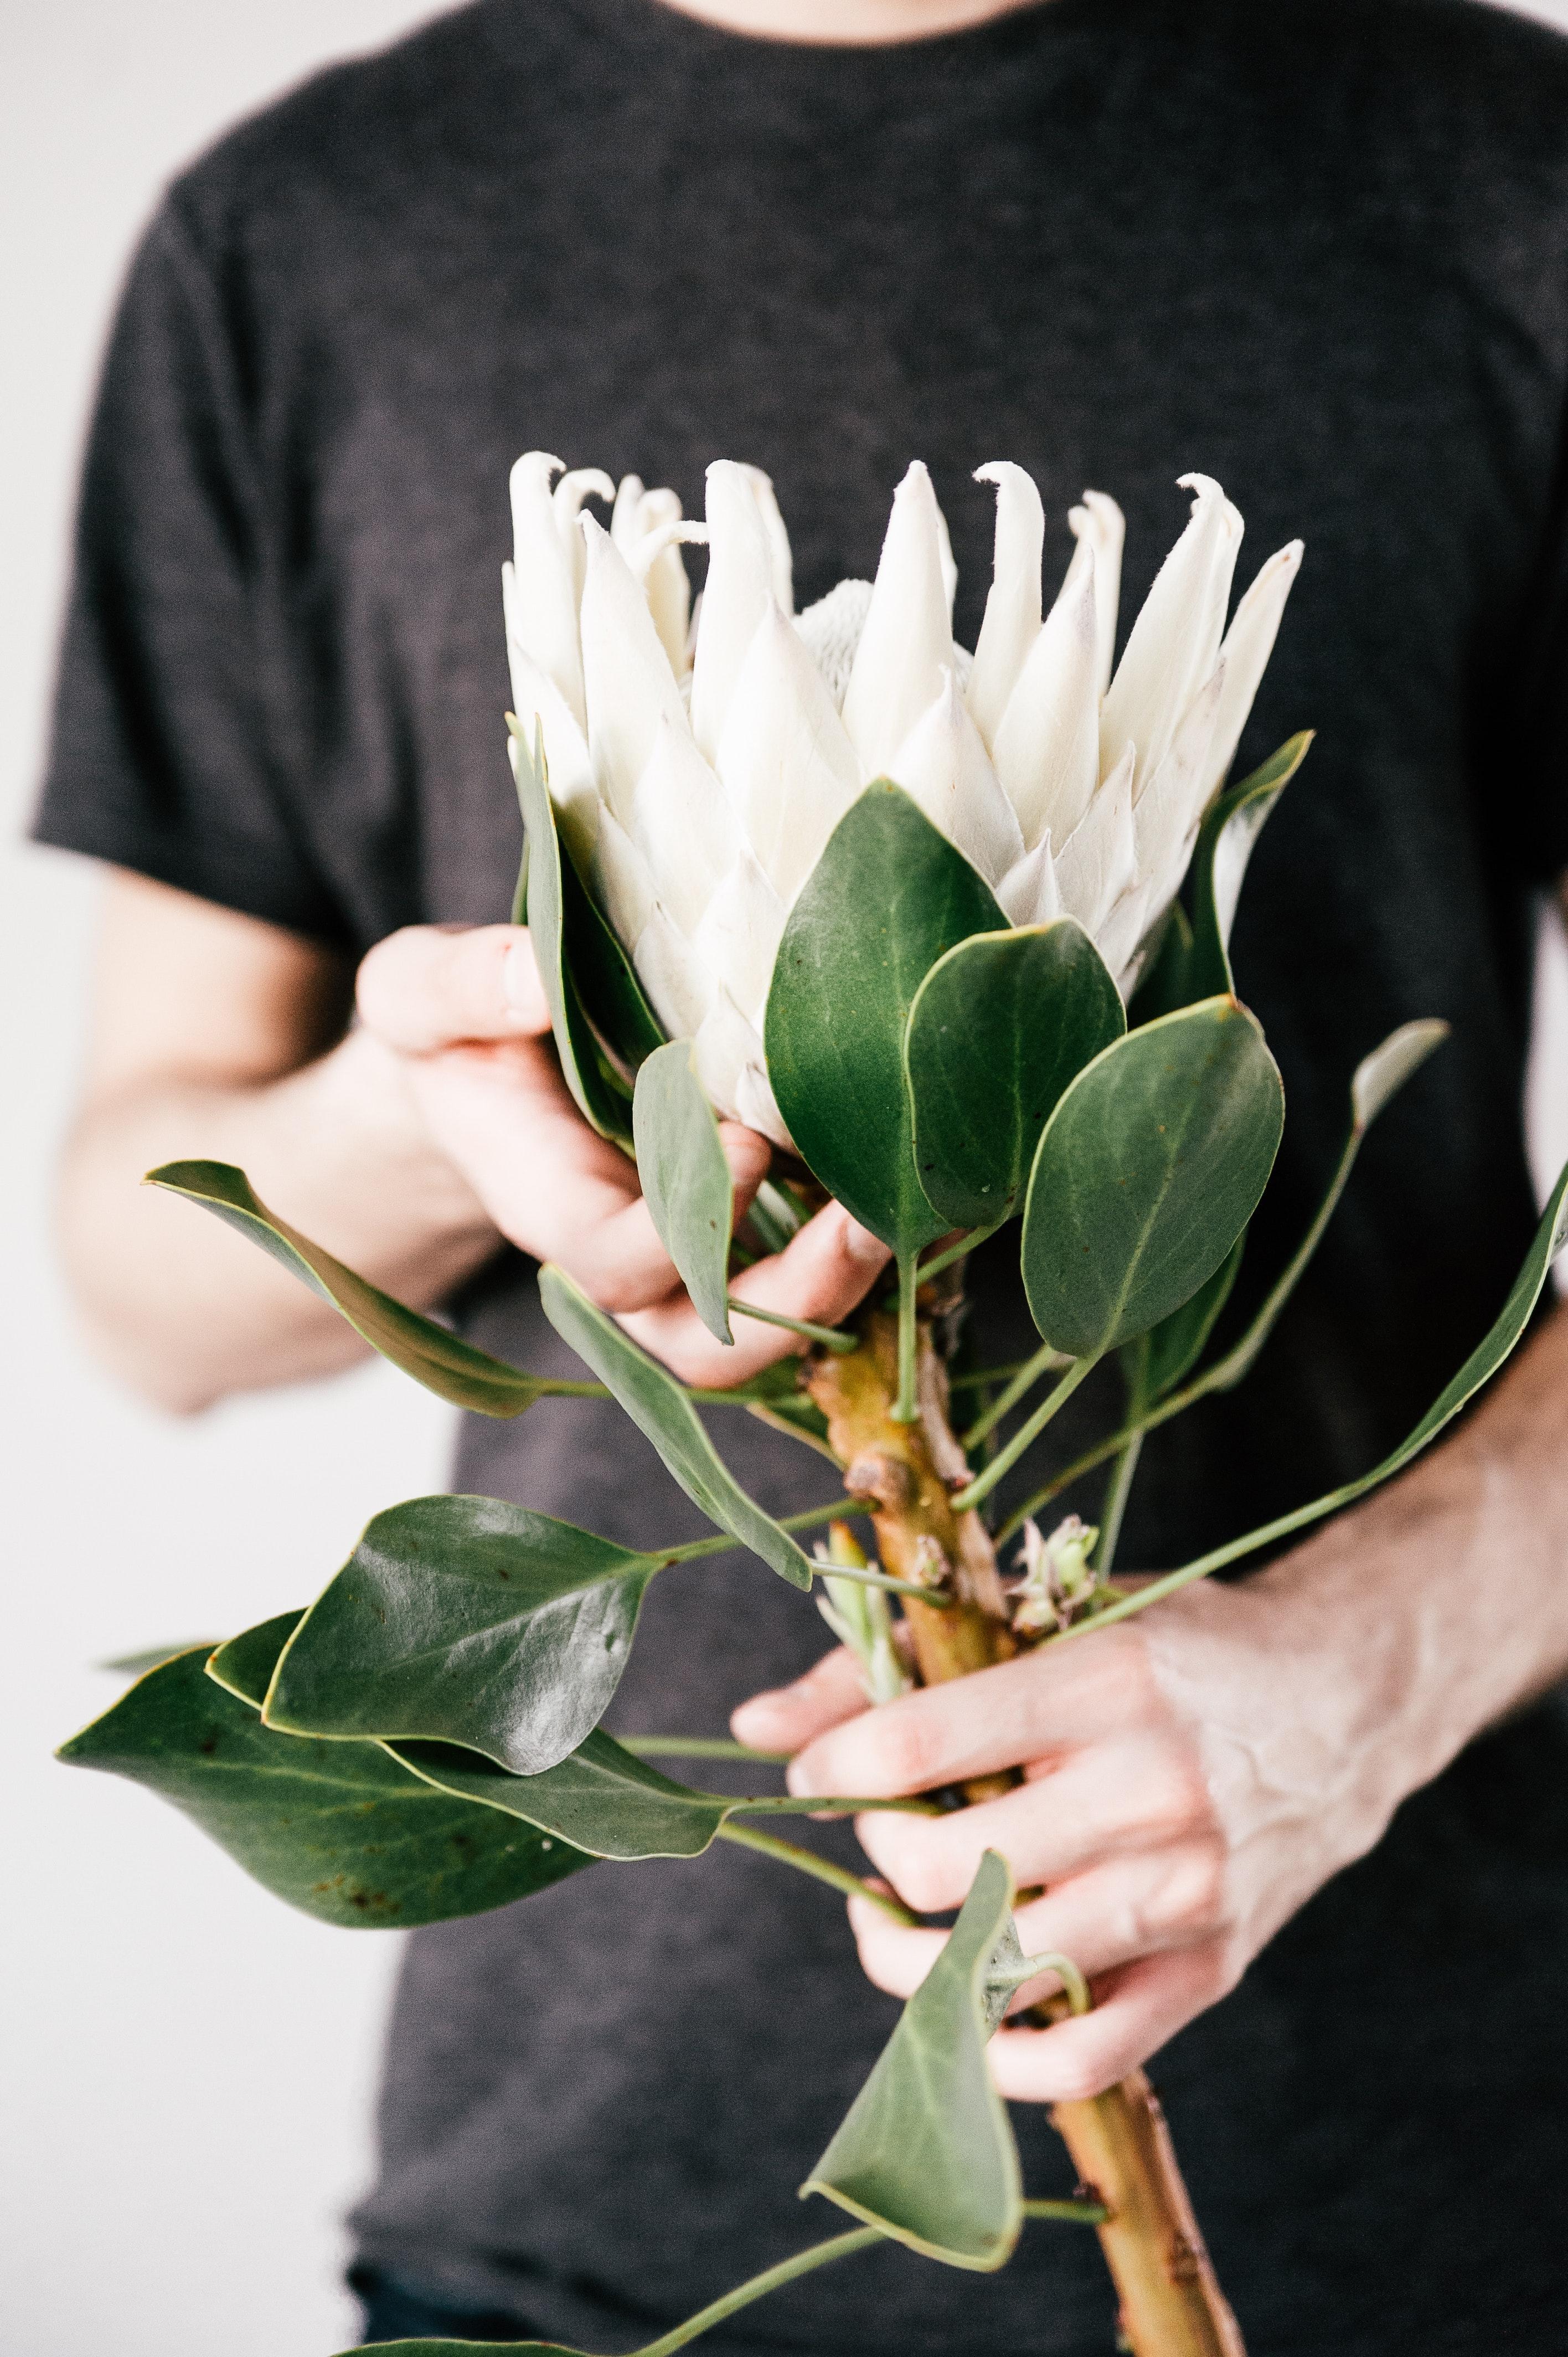 Free photo: Green Plants on Ground - Maturation, Macro